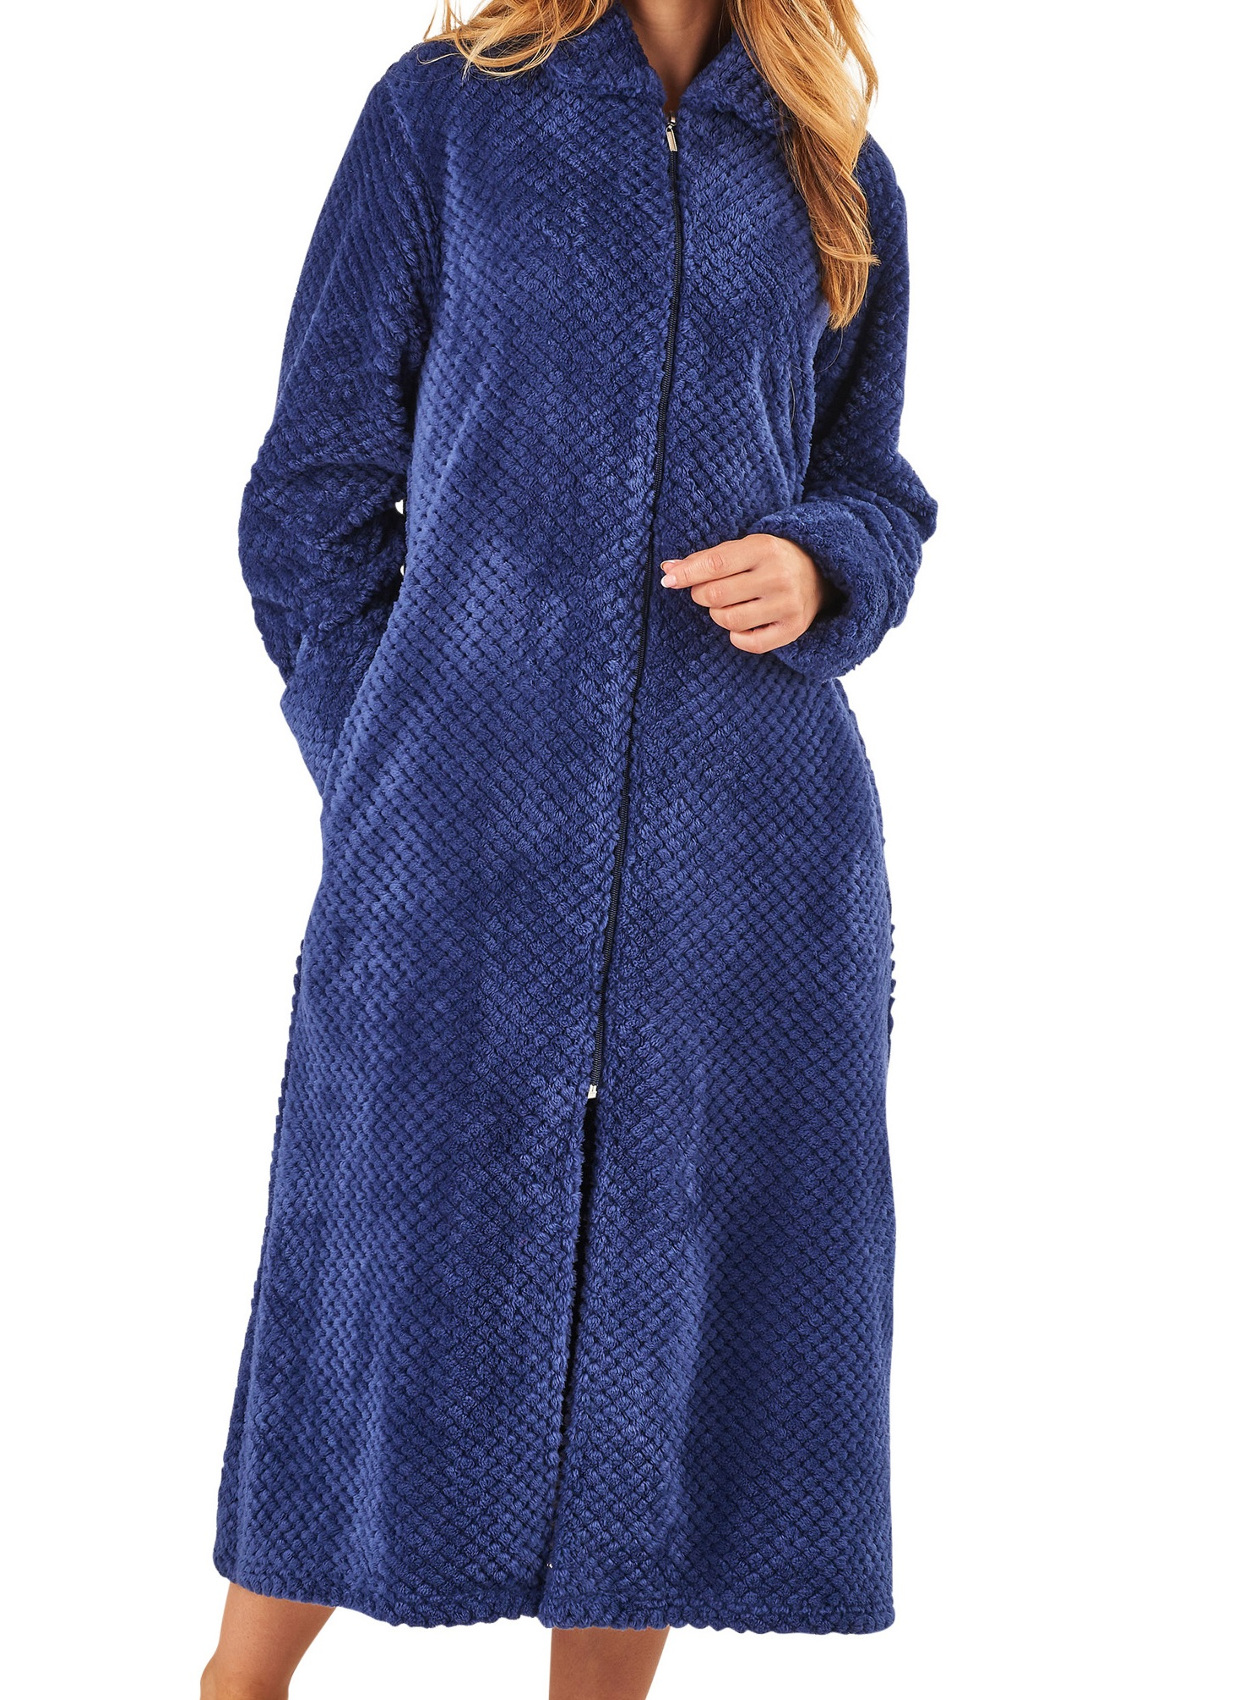 Dressing Gown Ladies Zip Up Soft Waffle Fleece Slenderella Nightwear Bath Robe